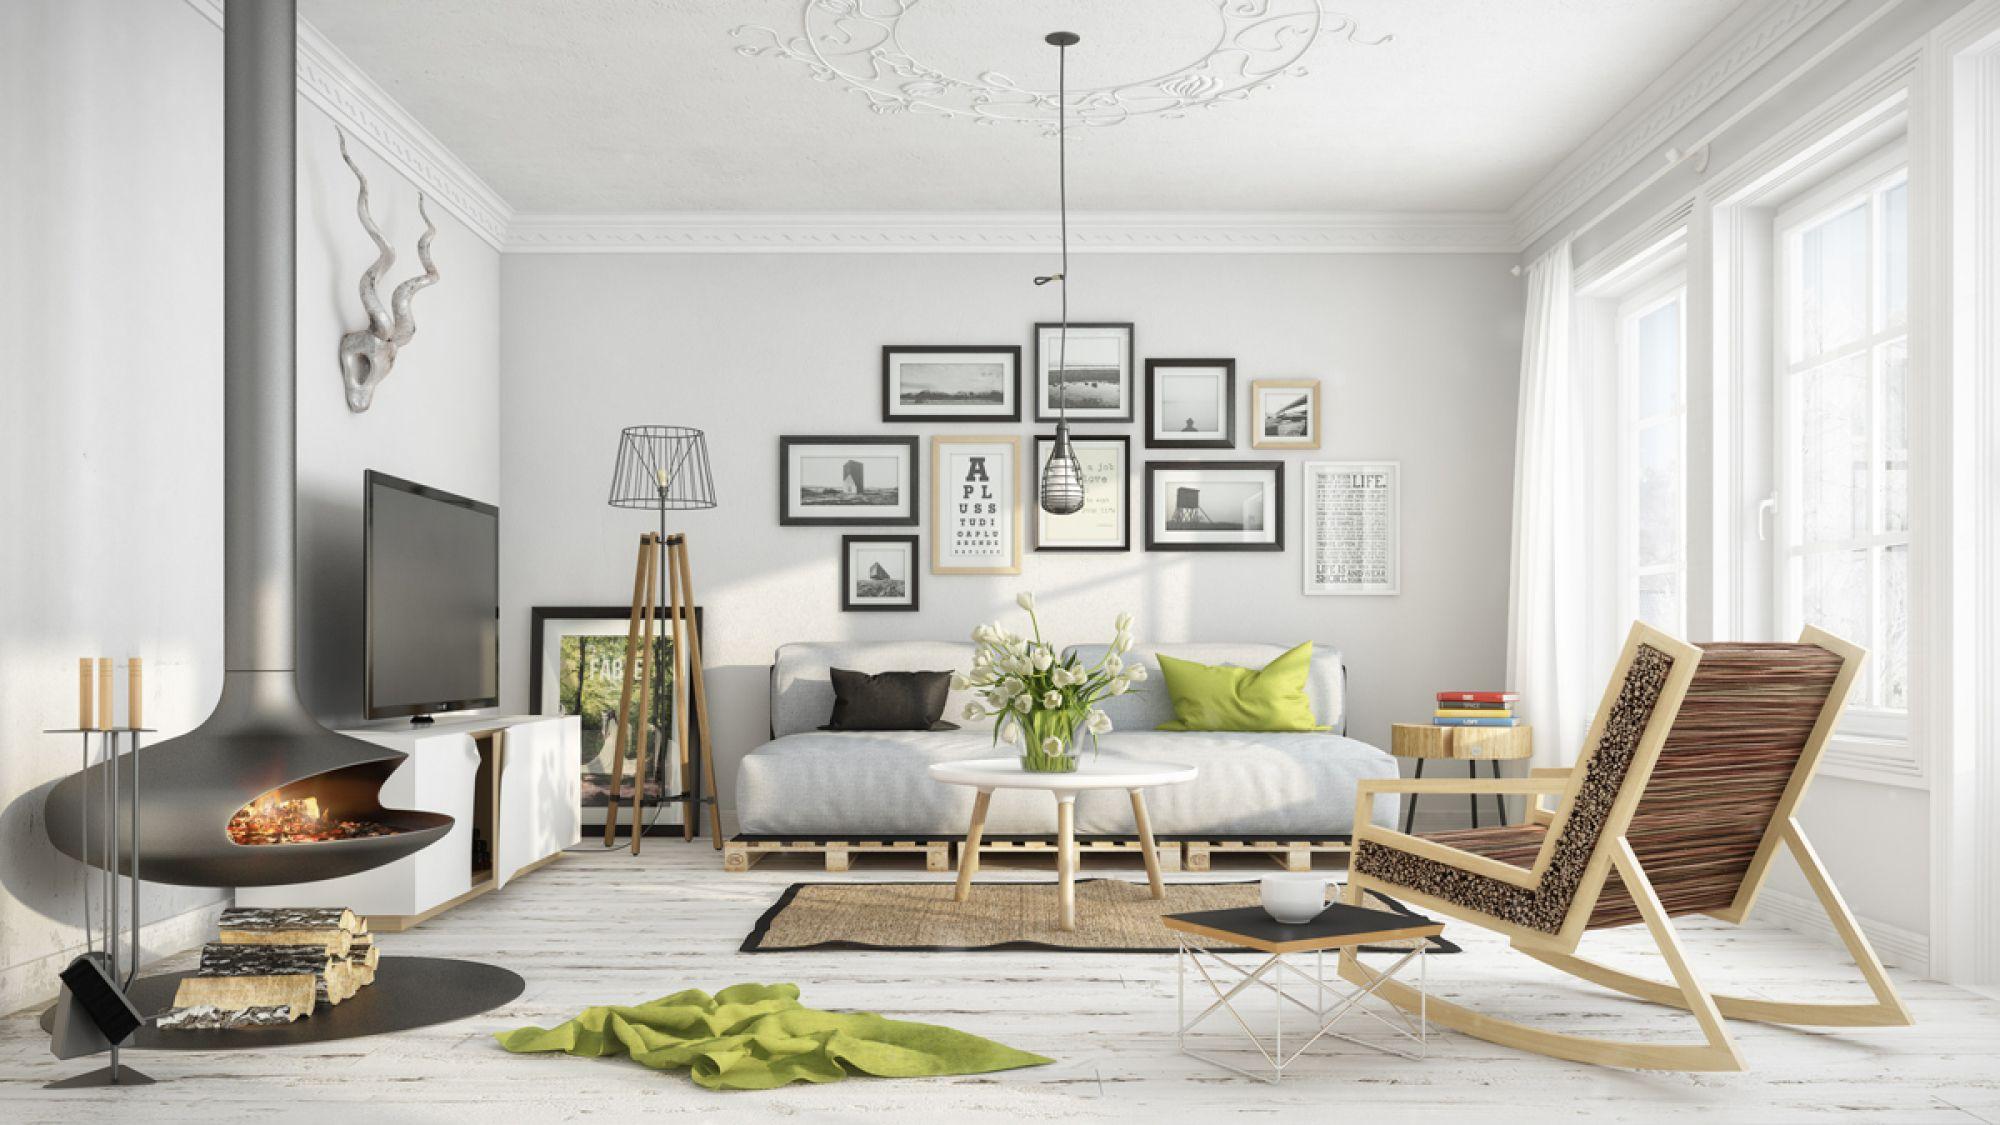 Pallet sofa juga mampu dijadikan perabot untuk konsep hiassan scandanavian